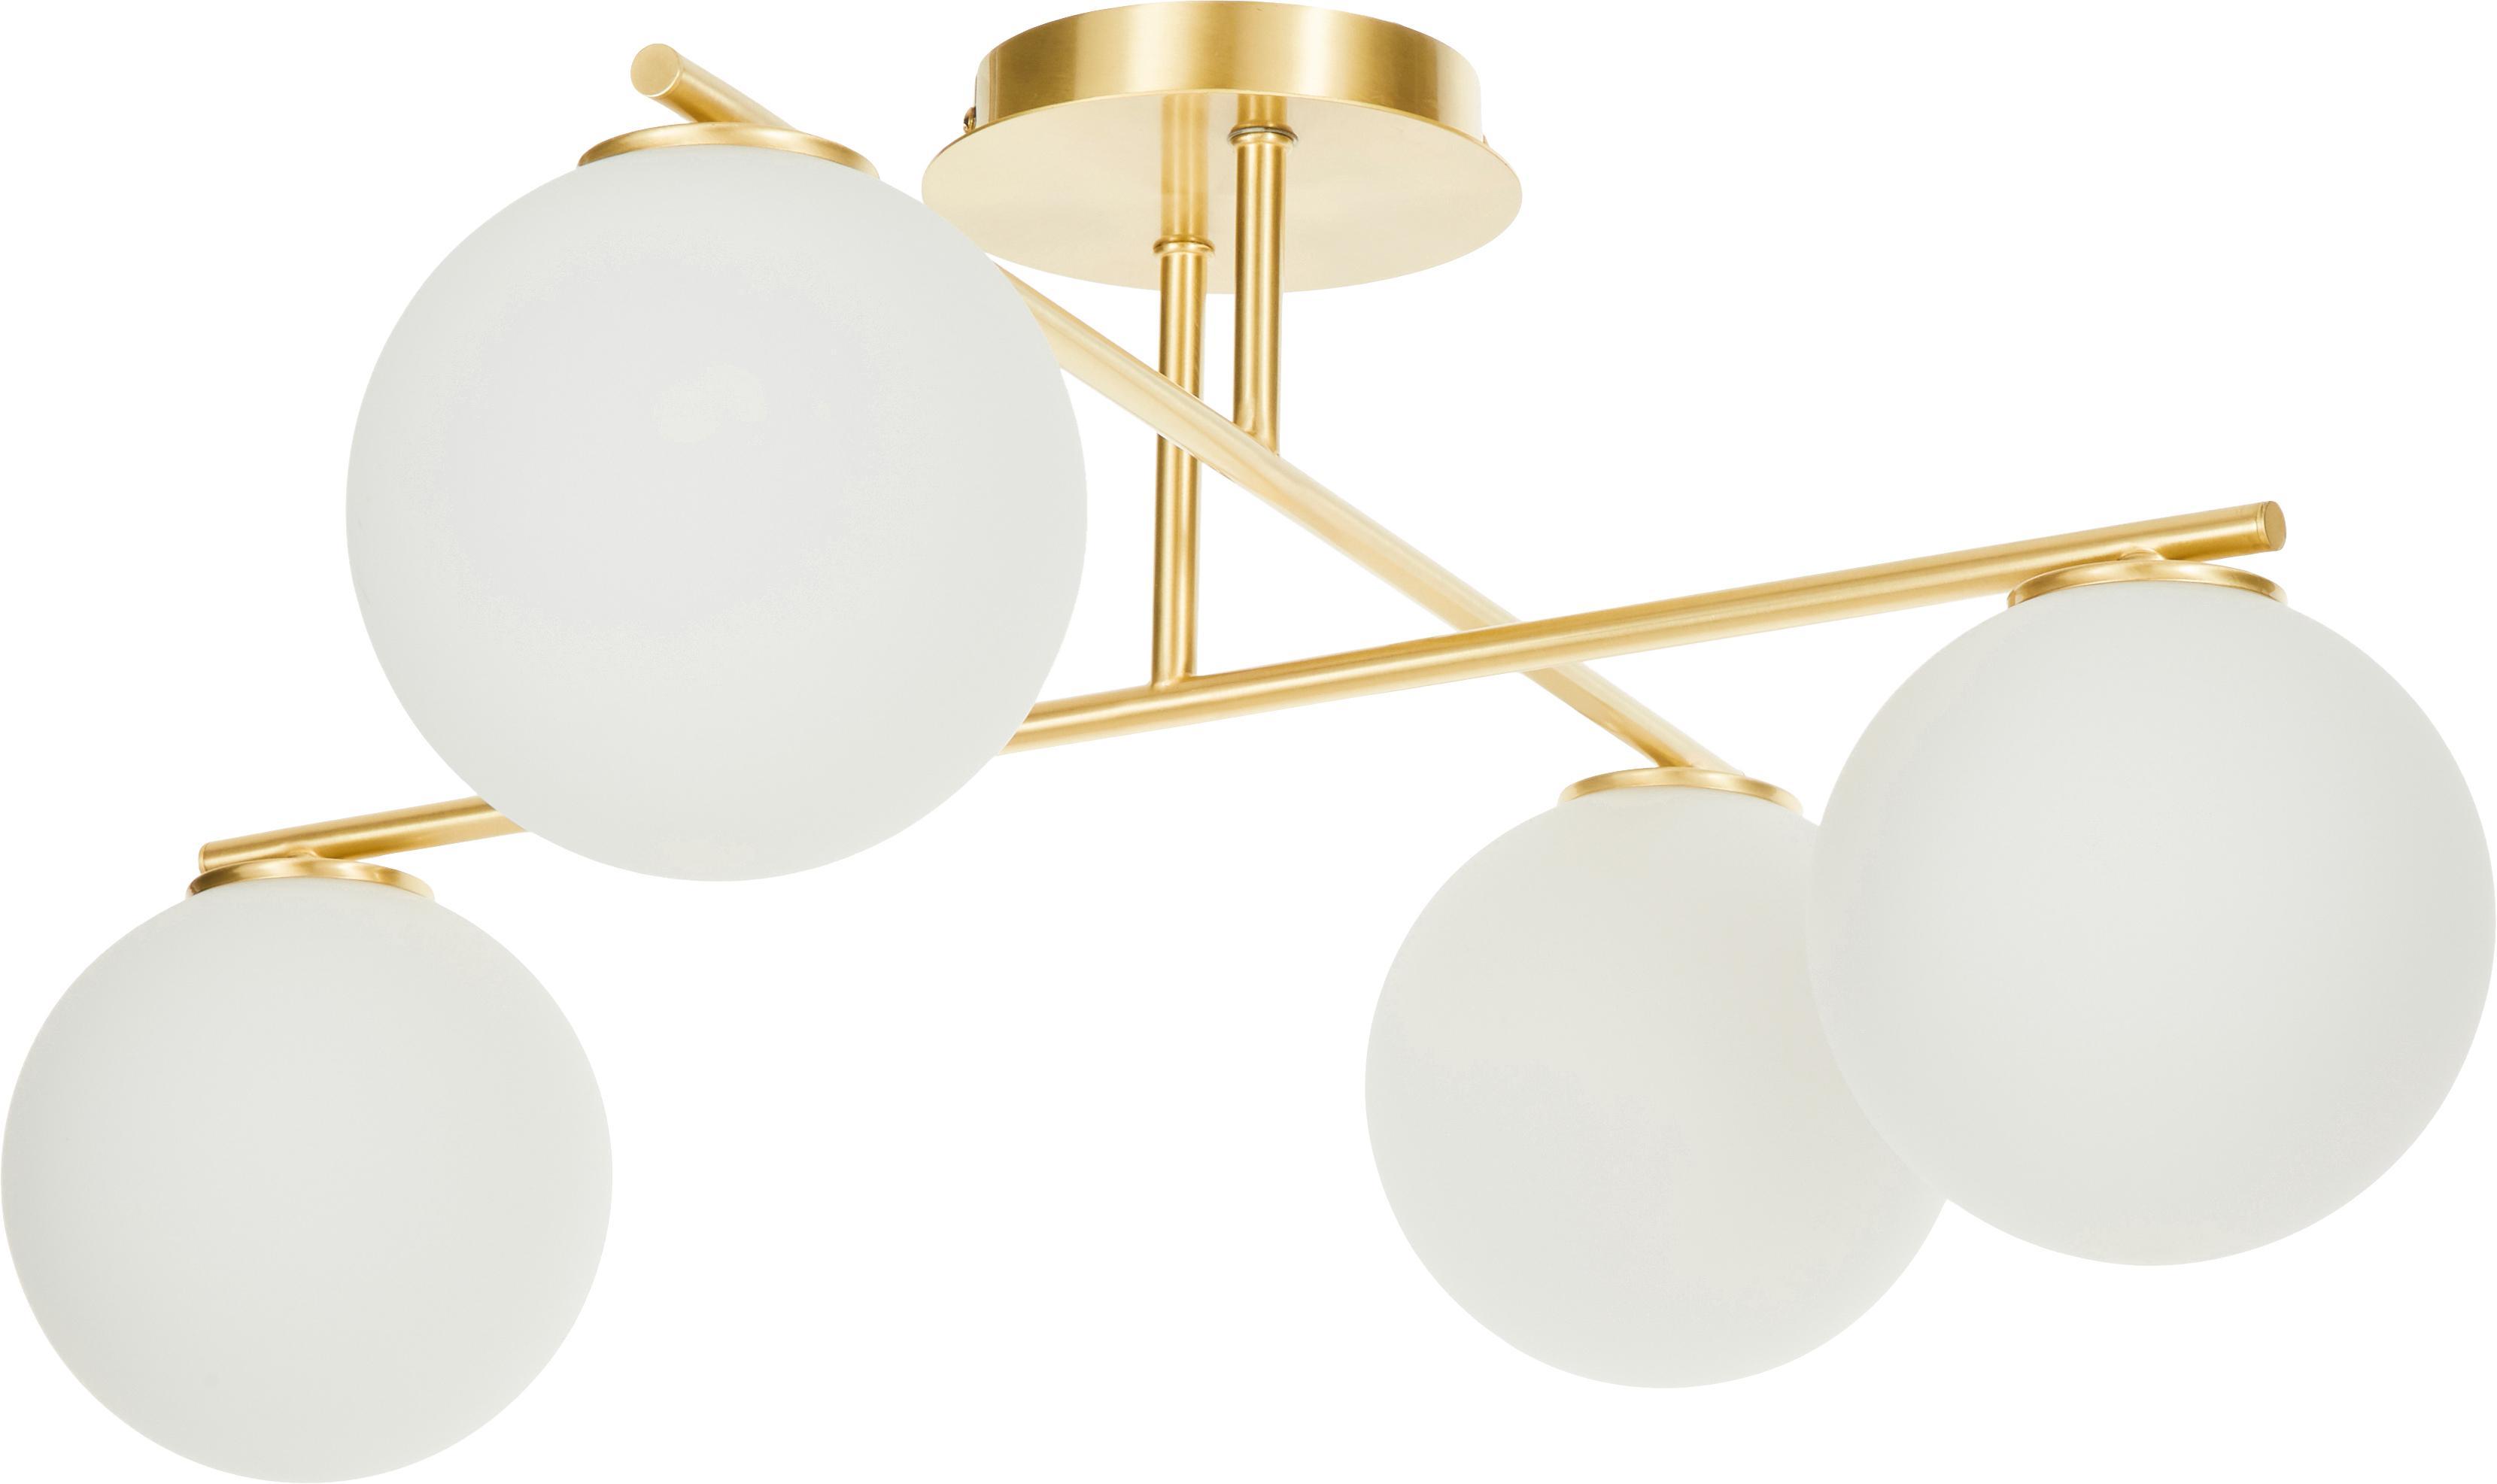 Lampada da soffitto dorata Atlanta, Baldacchino: metallo ottonato, Bianco, ottone, Larg. 65 x Alt. 30 cm